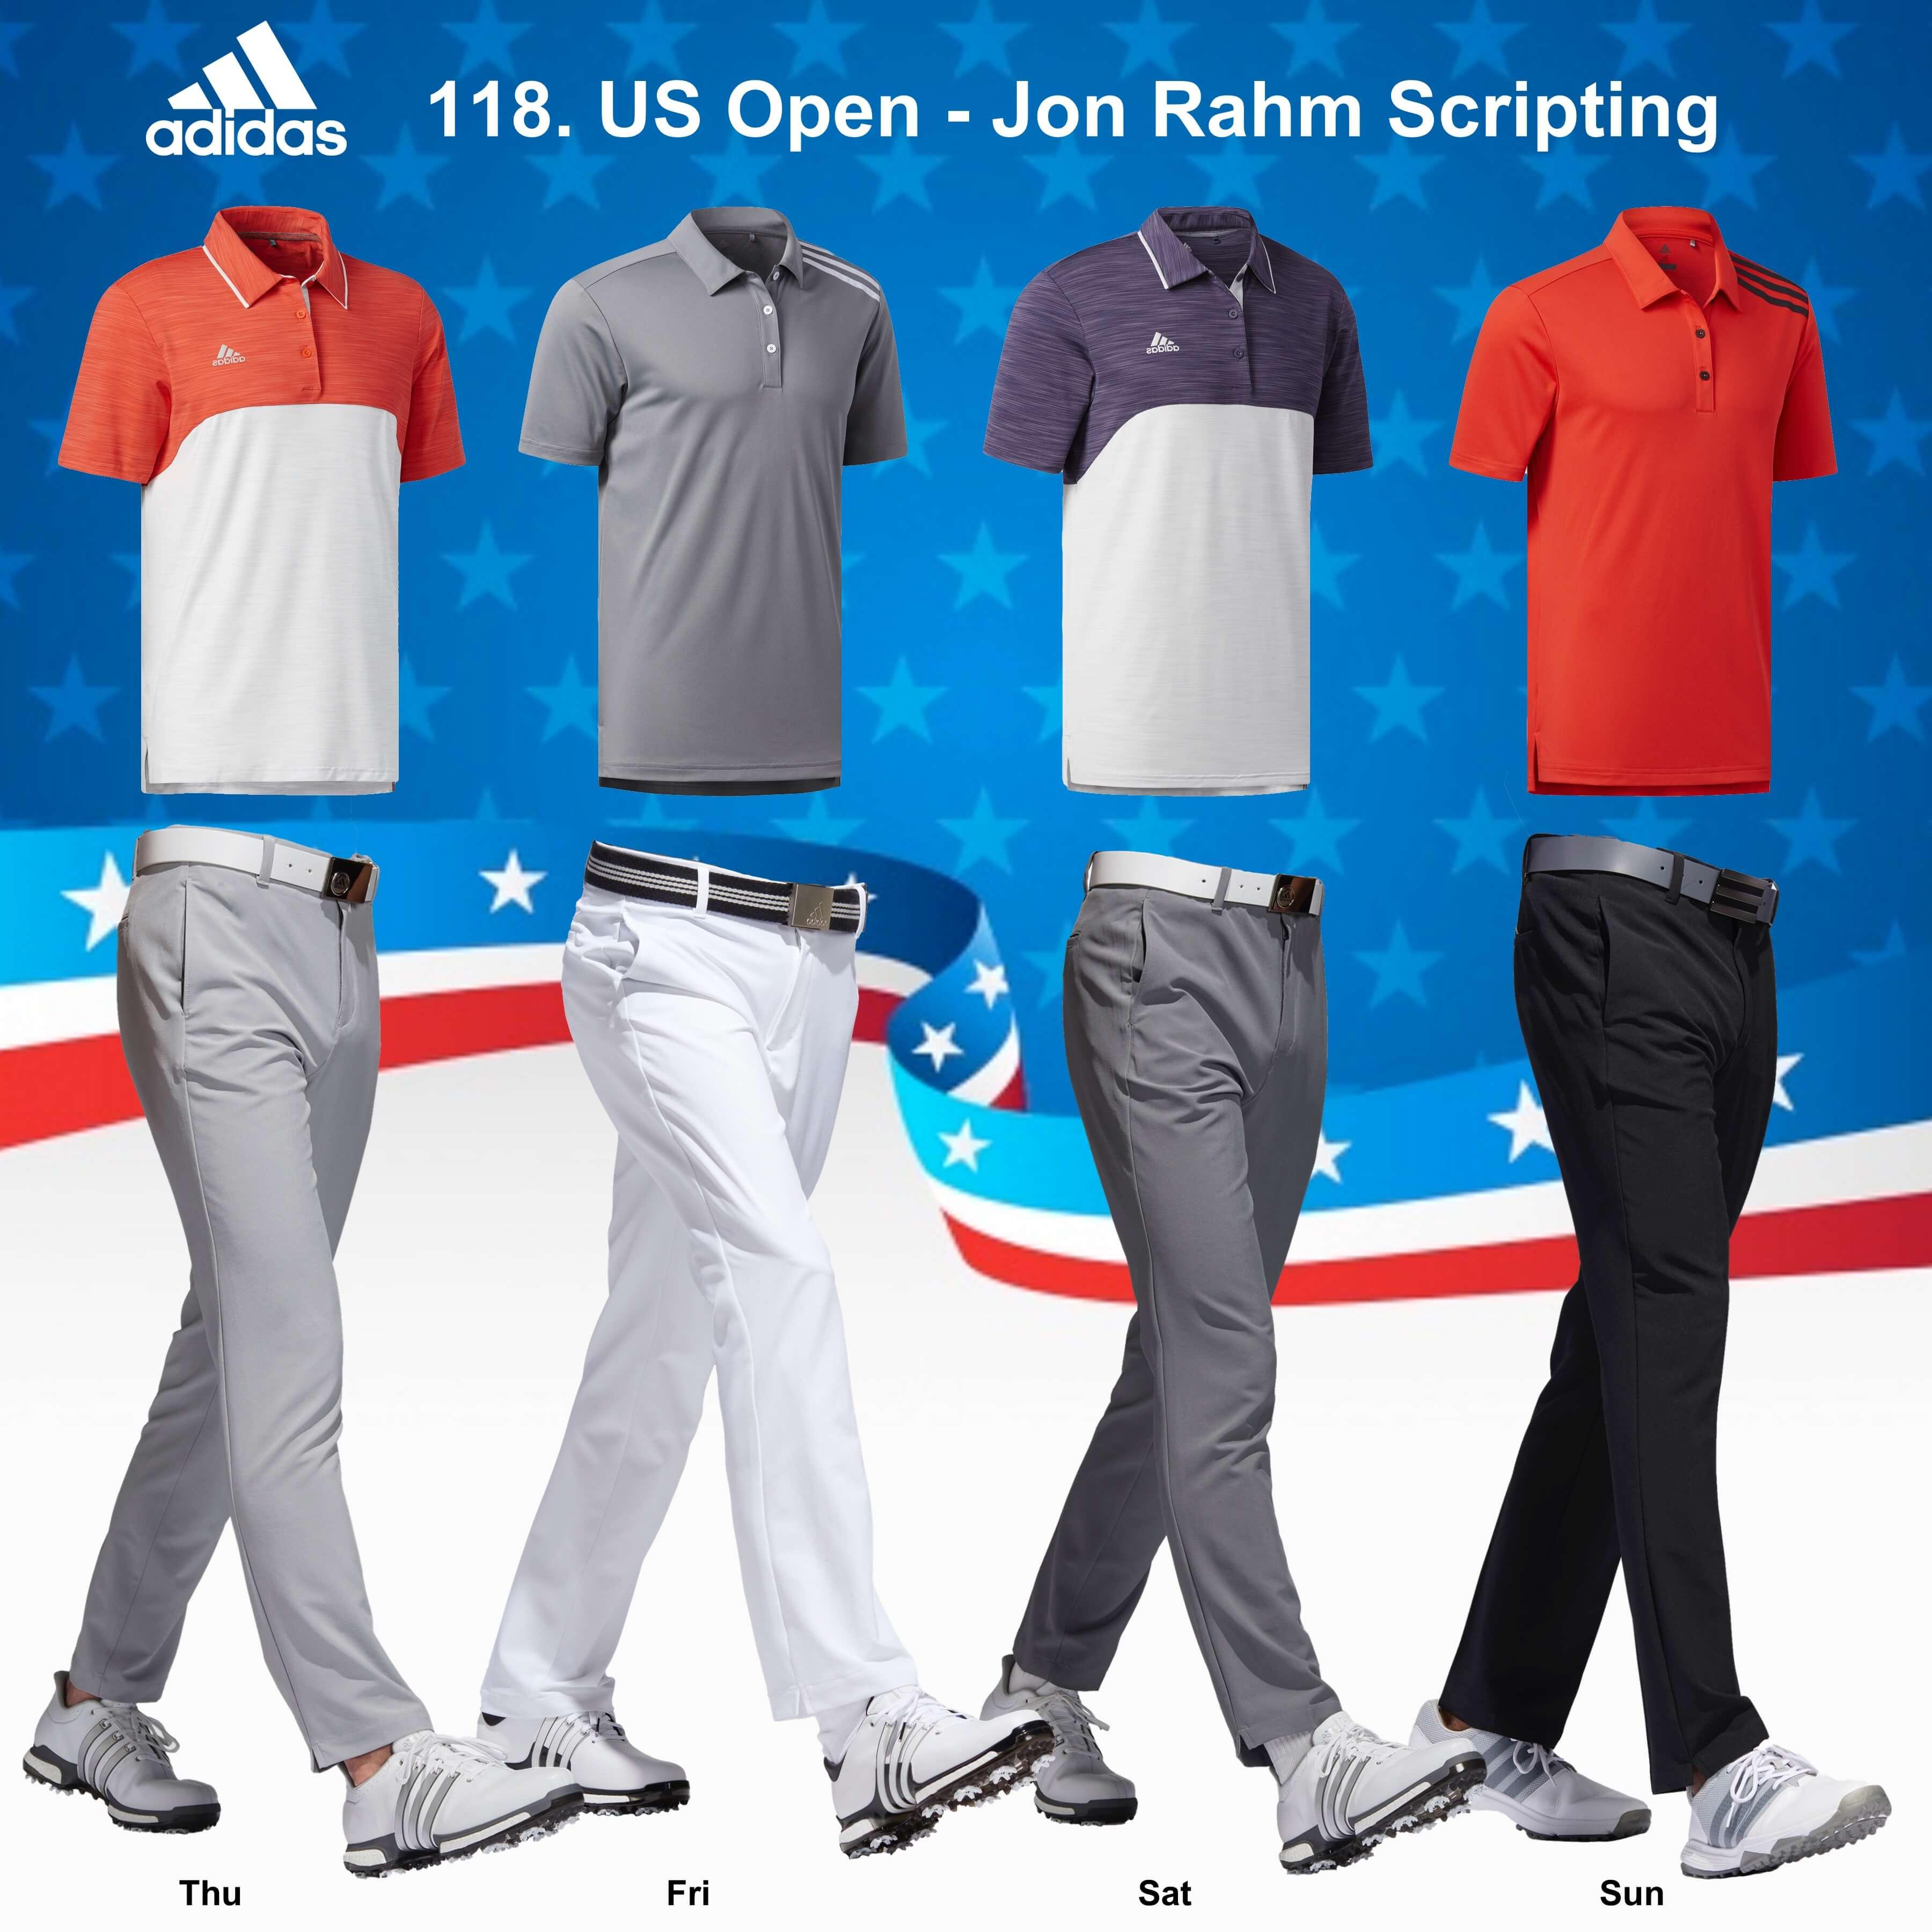 Jon Rahm 118. US Open Scripting